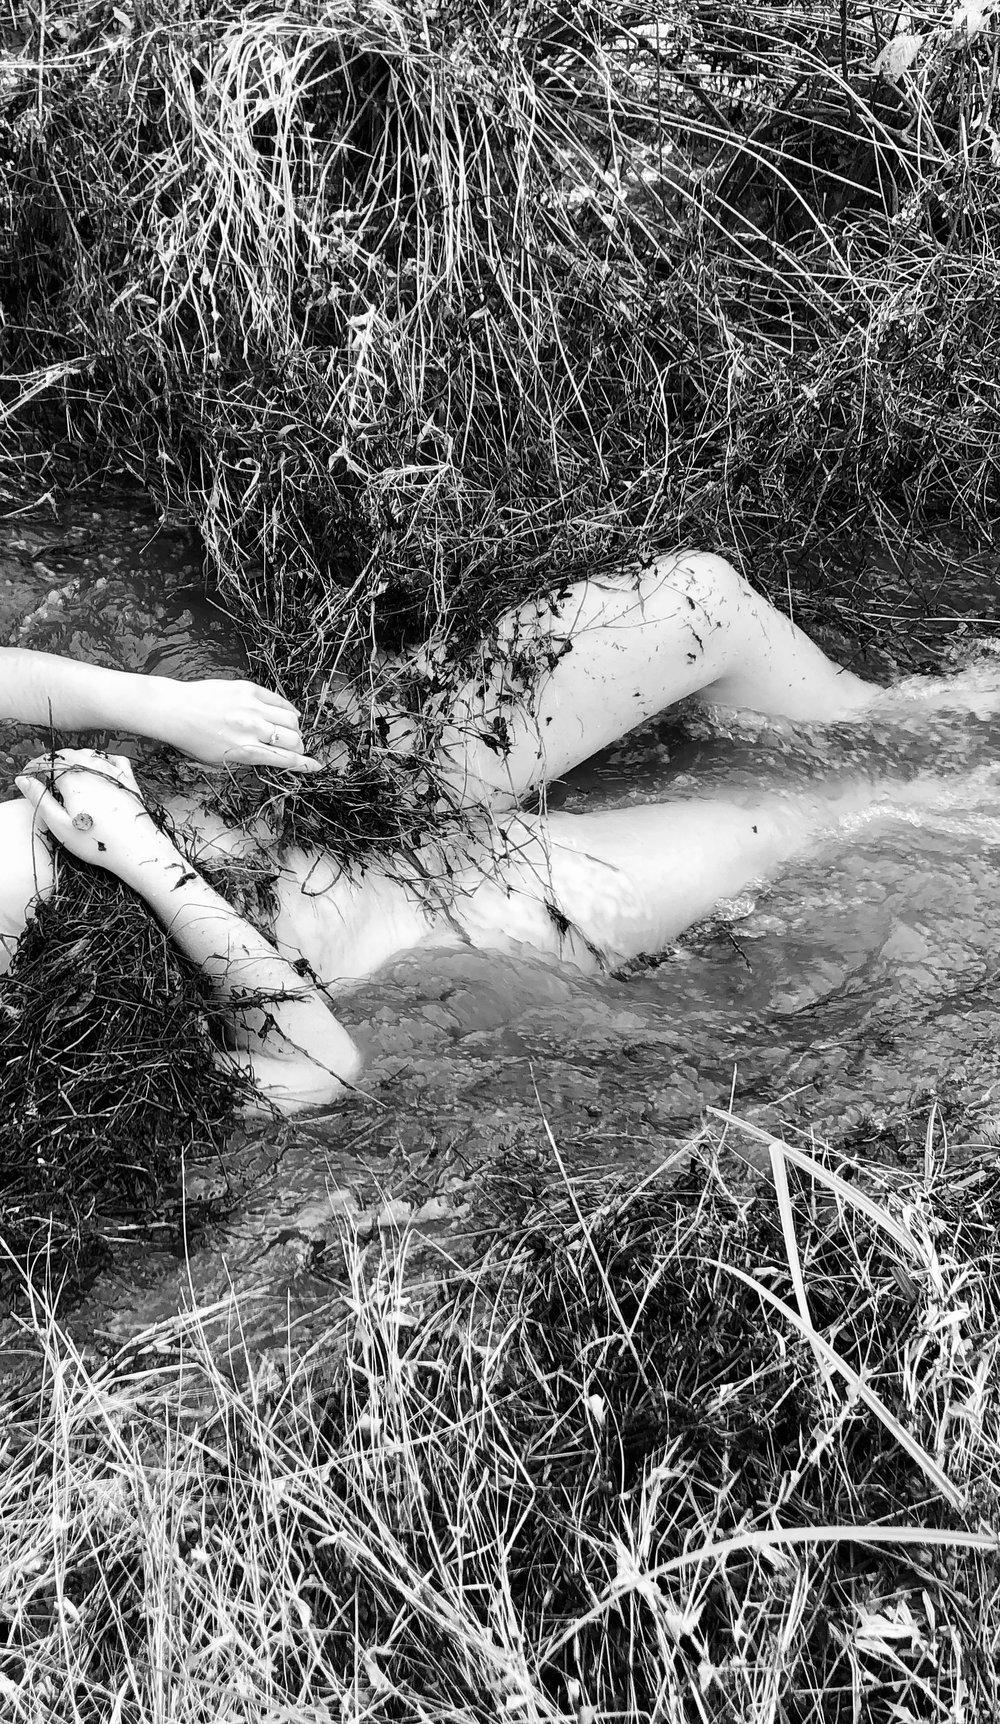 Bodies in the Landscape, December 2018